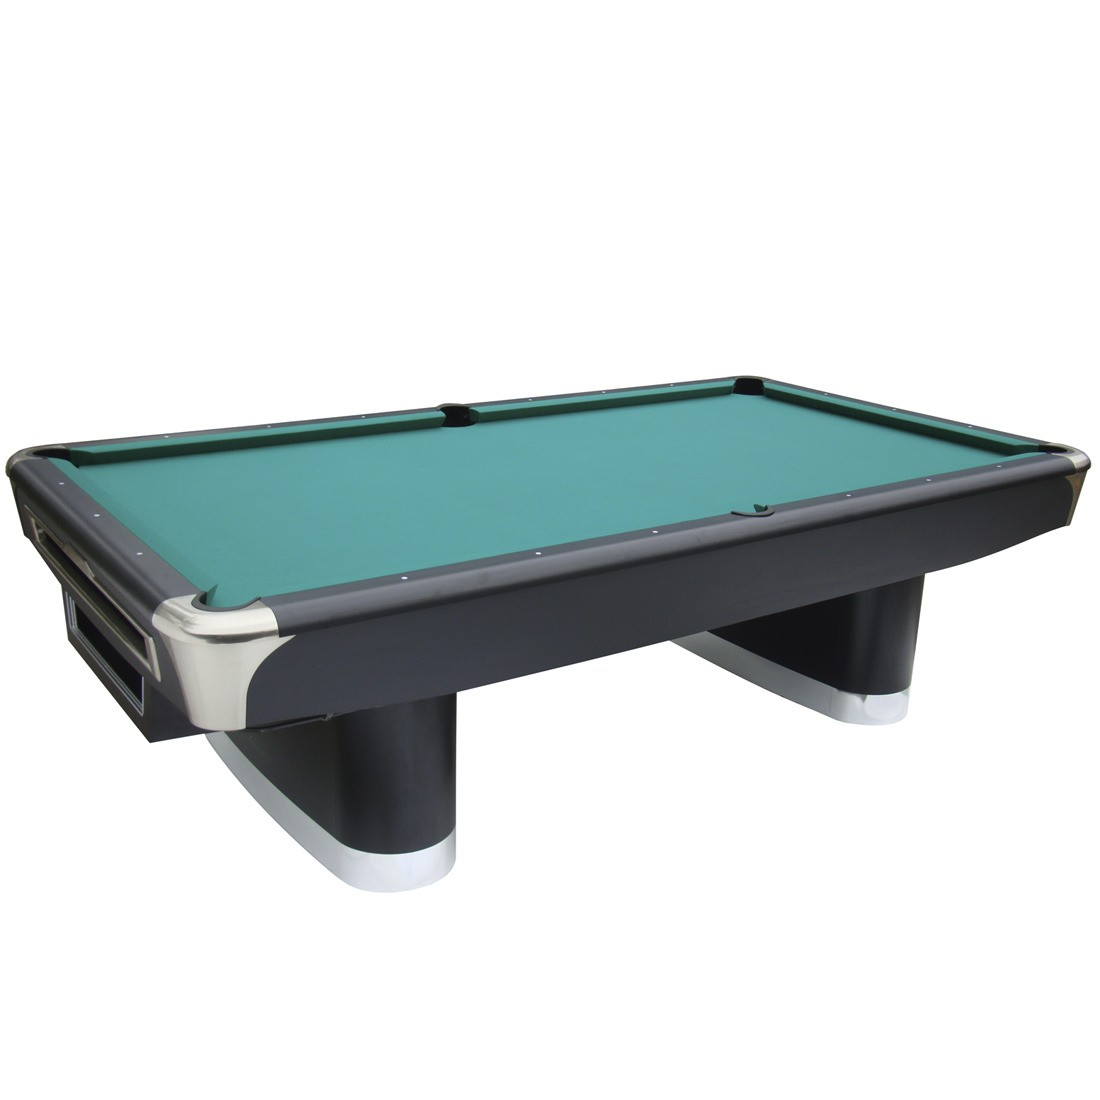 9 39 imperial duke 1 slate pool table - Slate pool table ...